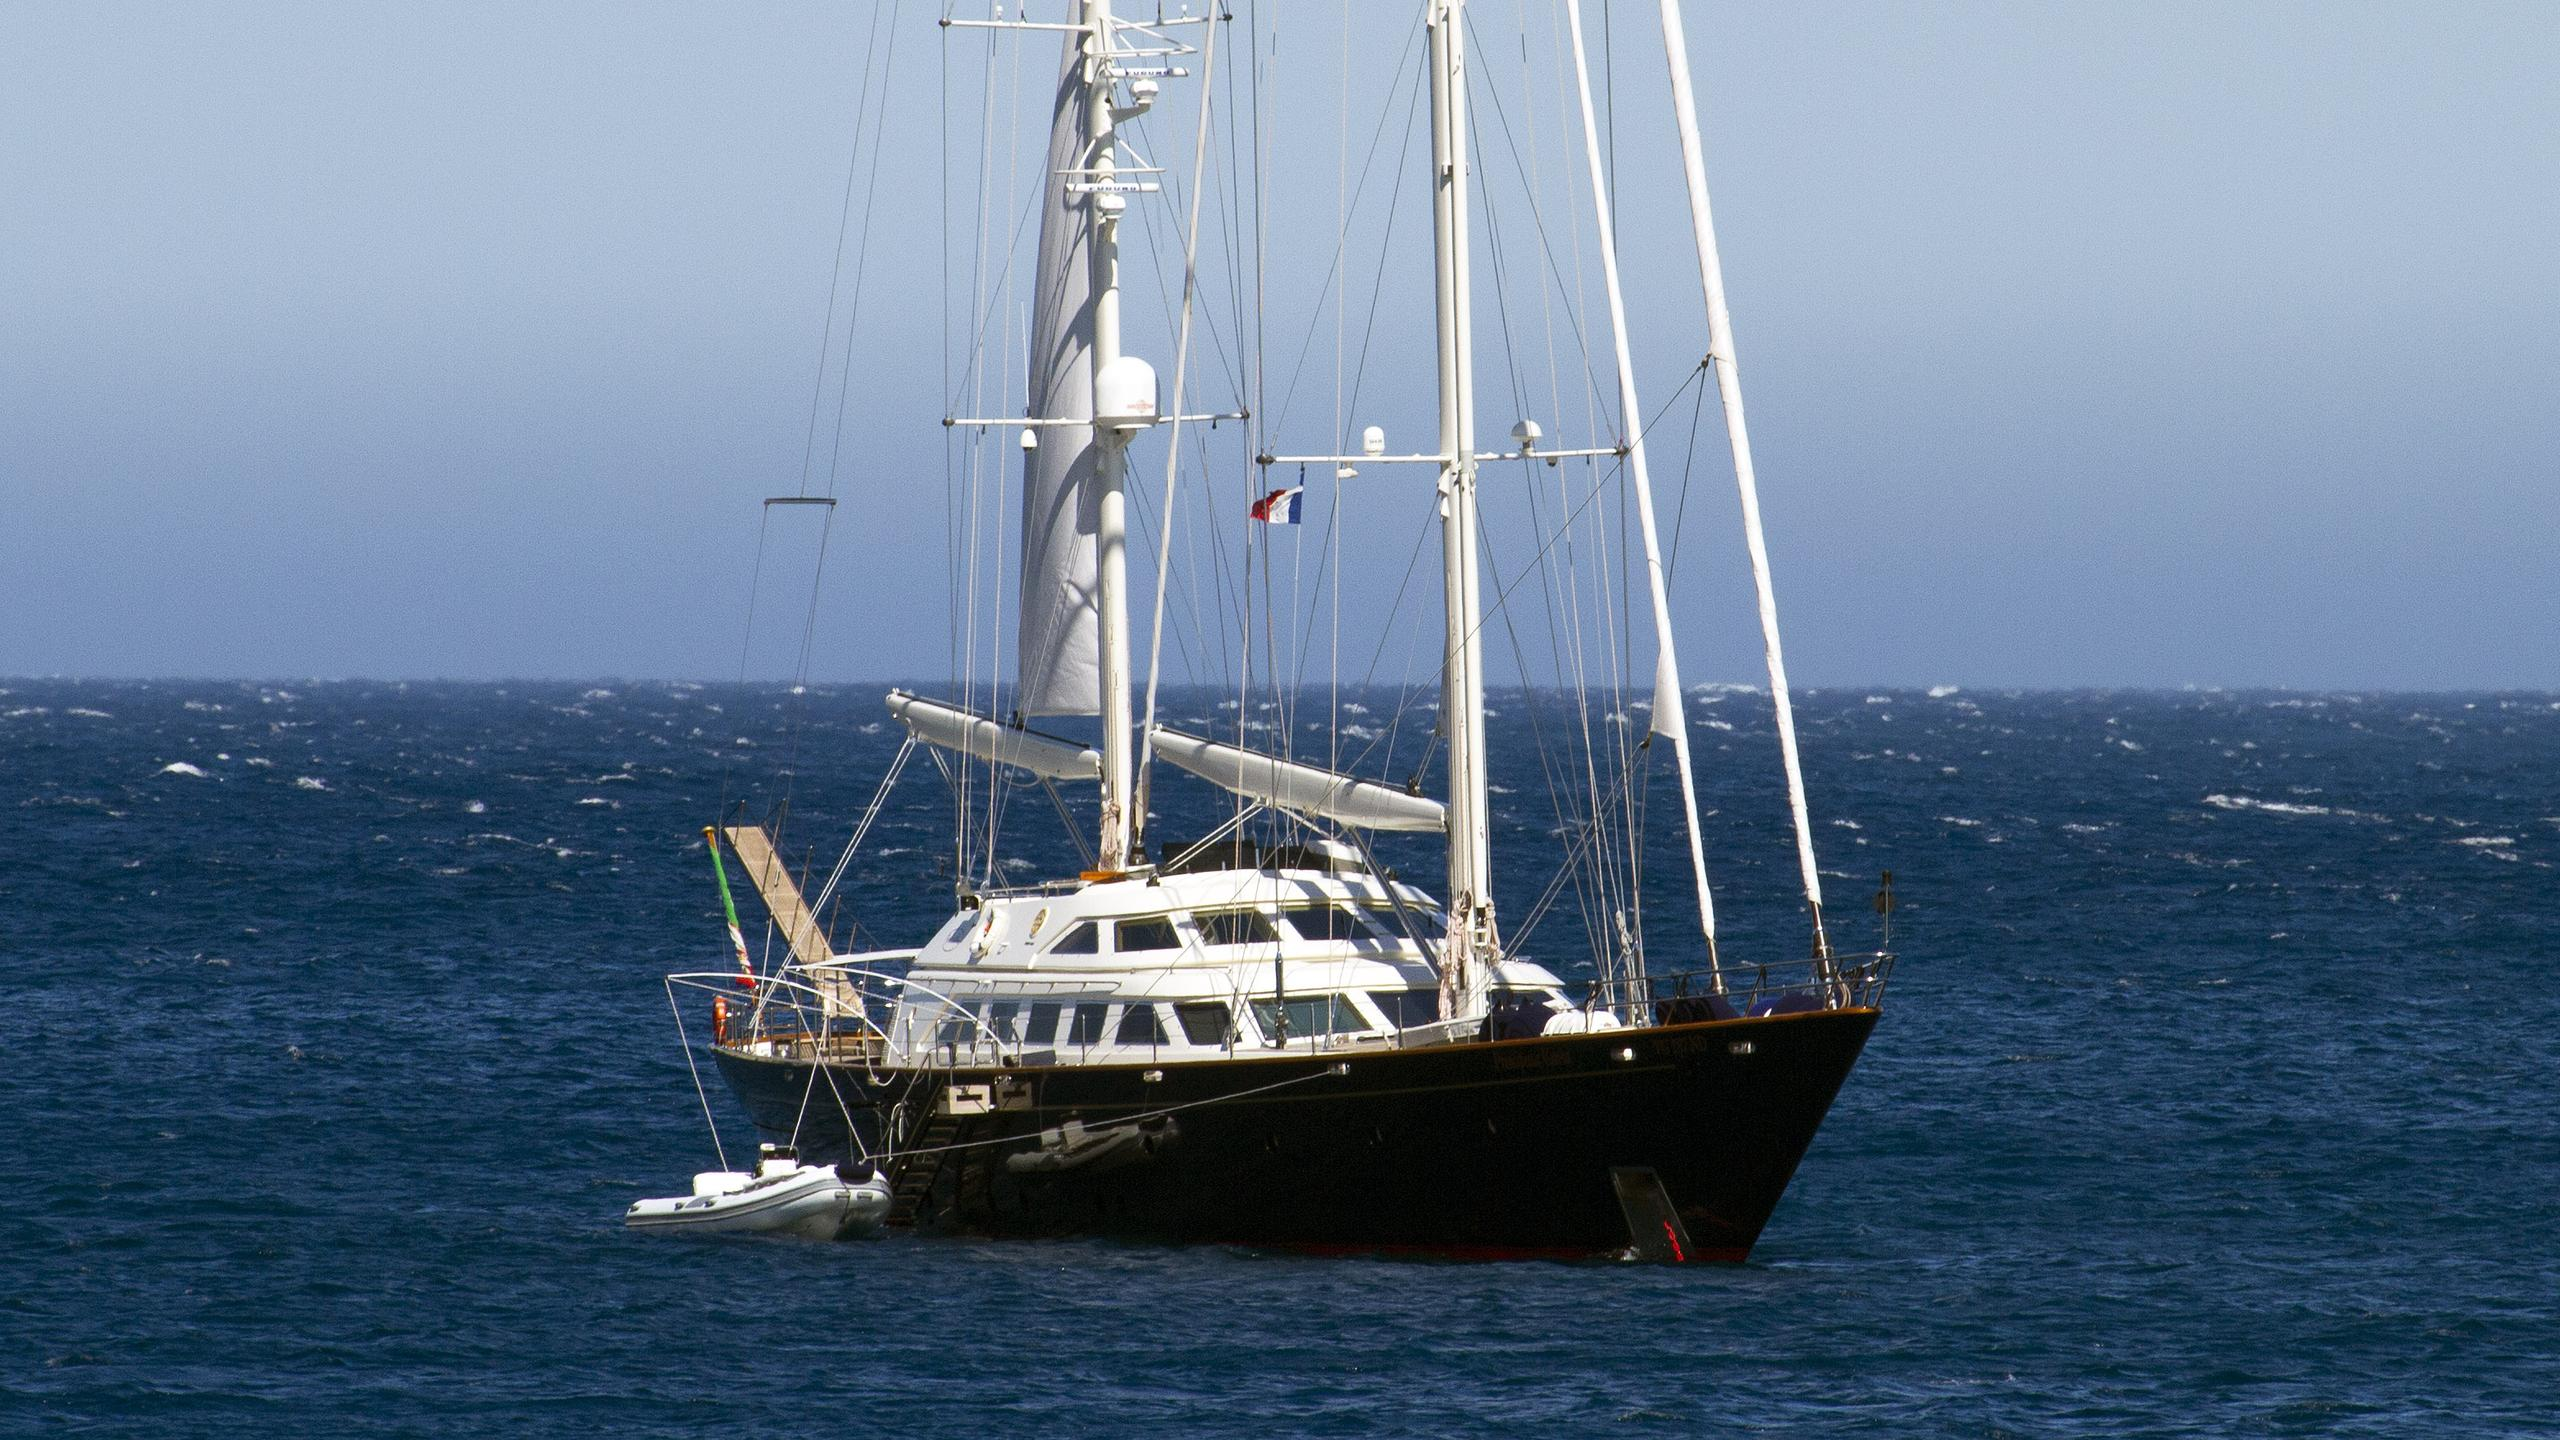 principessa-vaivia-sailing-yacht-perini-navi-1991-40m-half-profile